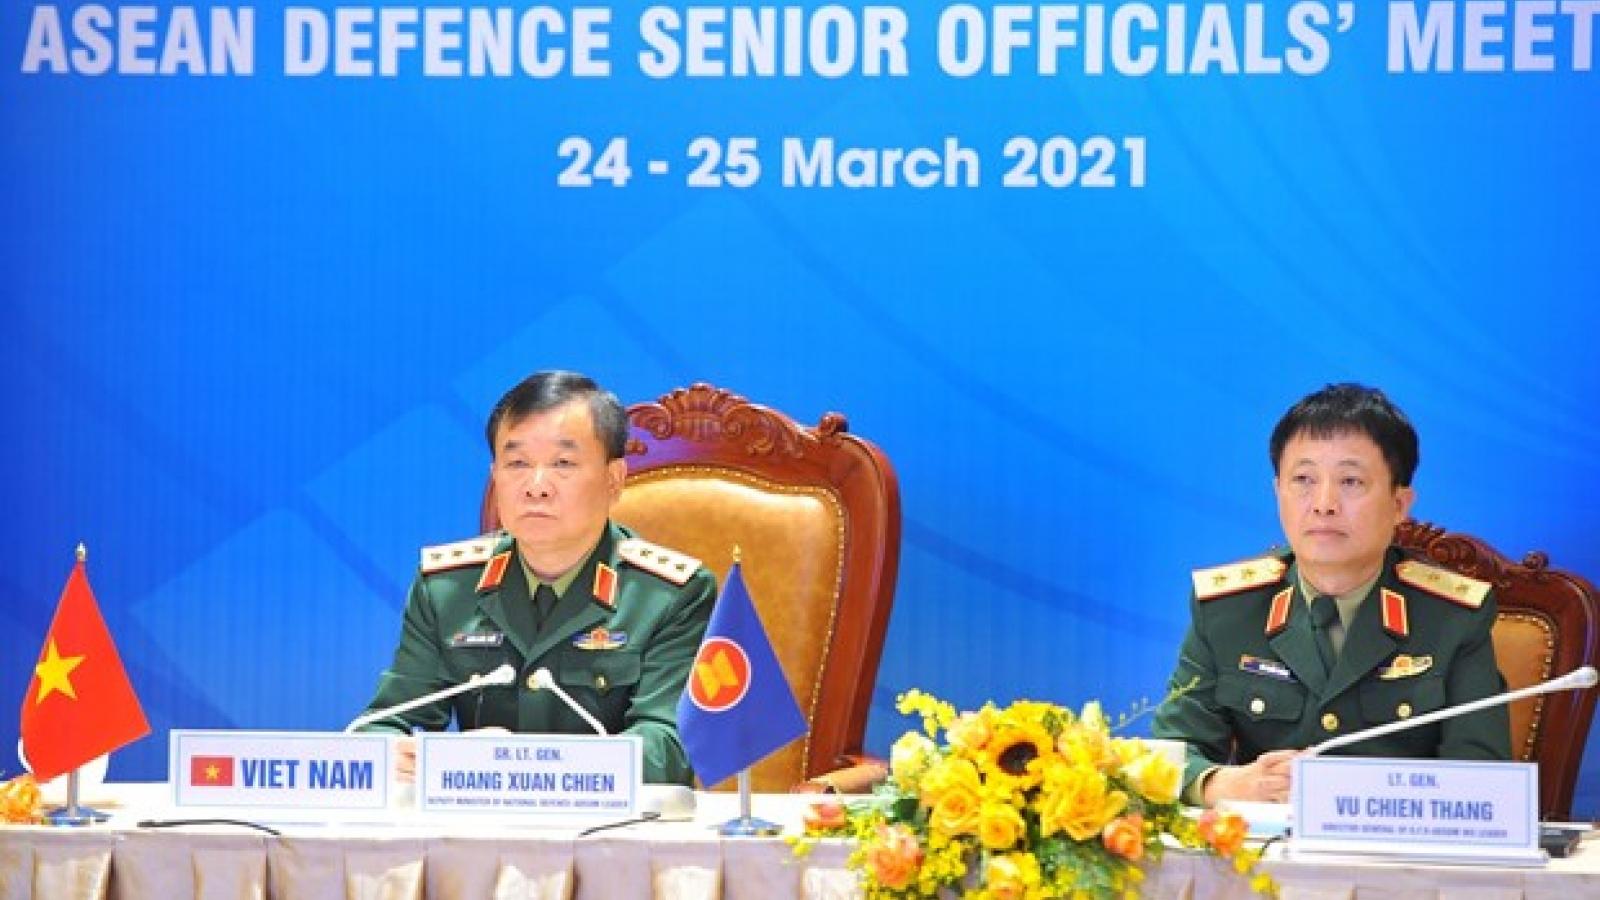 ASEAN Defence Senior Officials' Meeting convenes